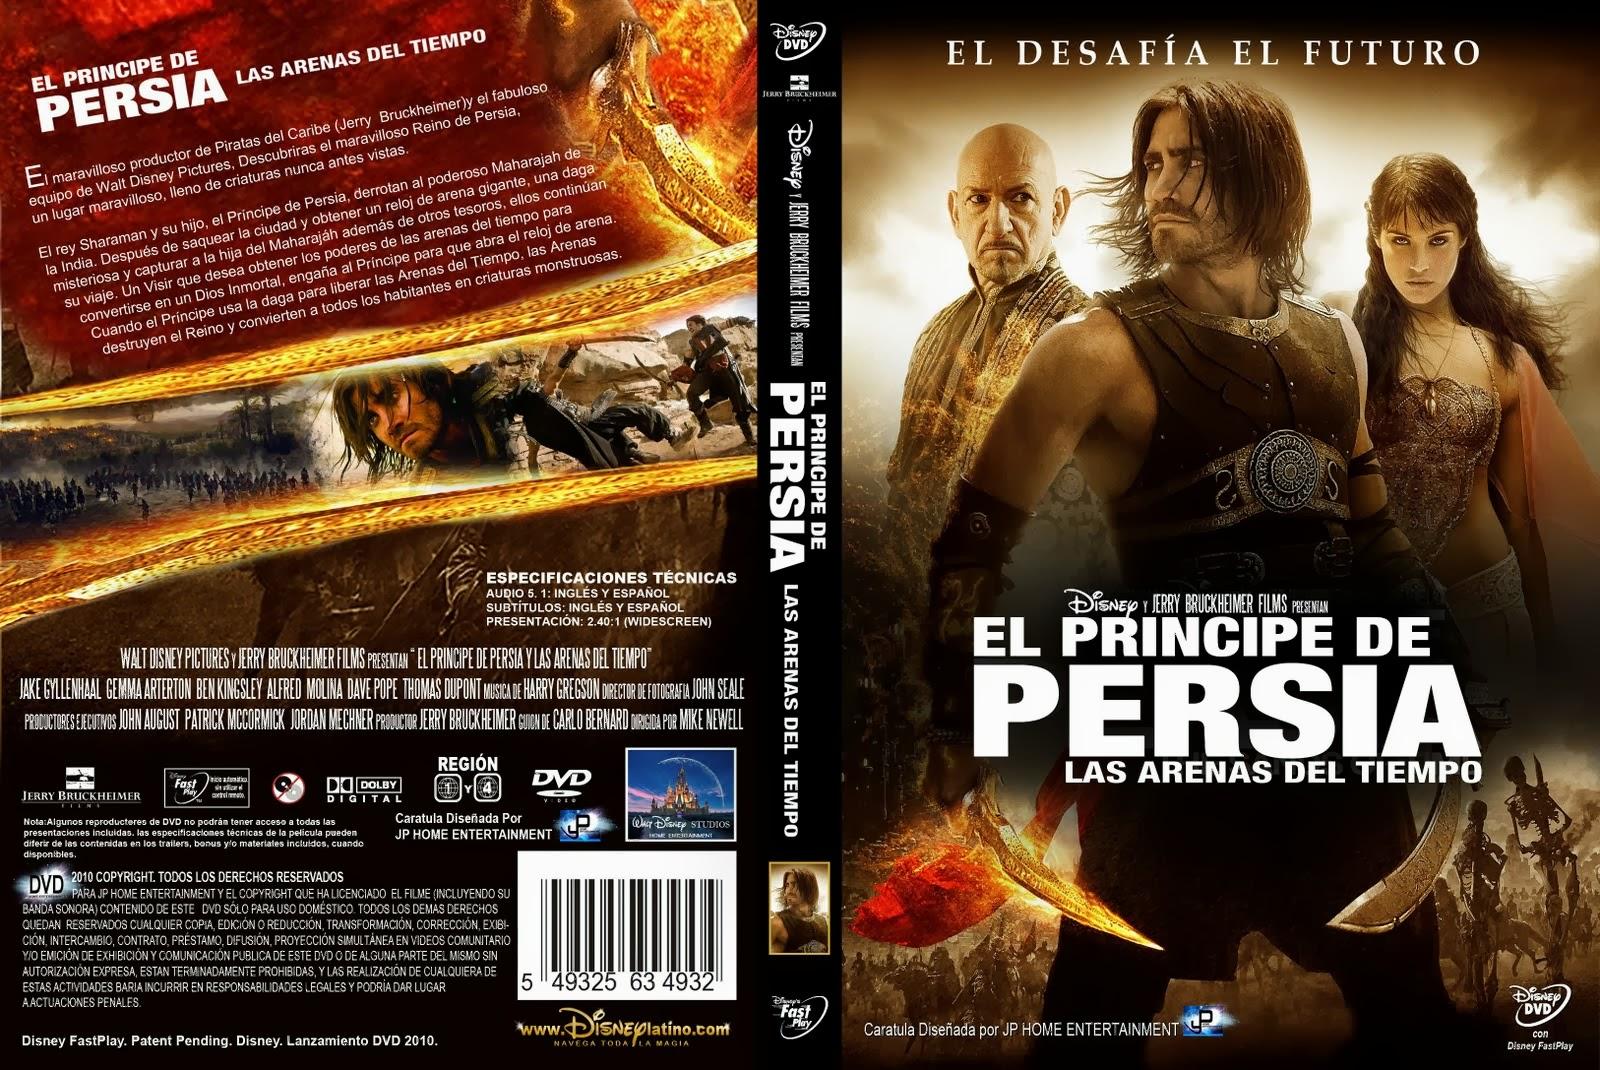 Jentay de principe of percia fucked movie